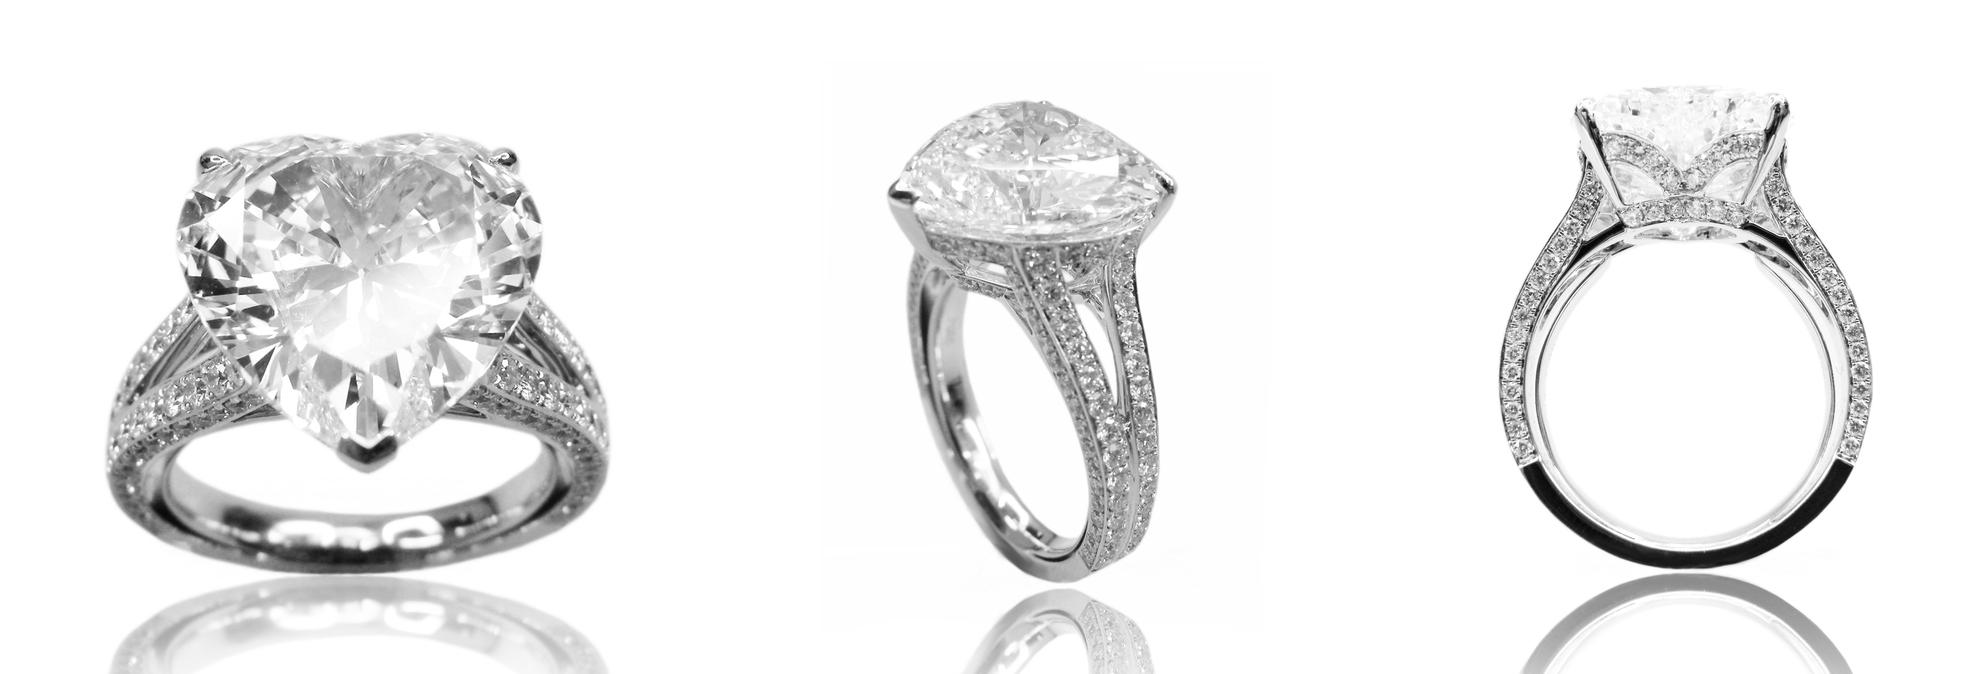 HEART SHAPE DIAMOND SOLITAIRE BESPOKE FINE JEWELLERY BY SHAHINA HATTA